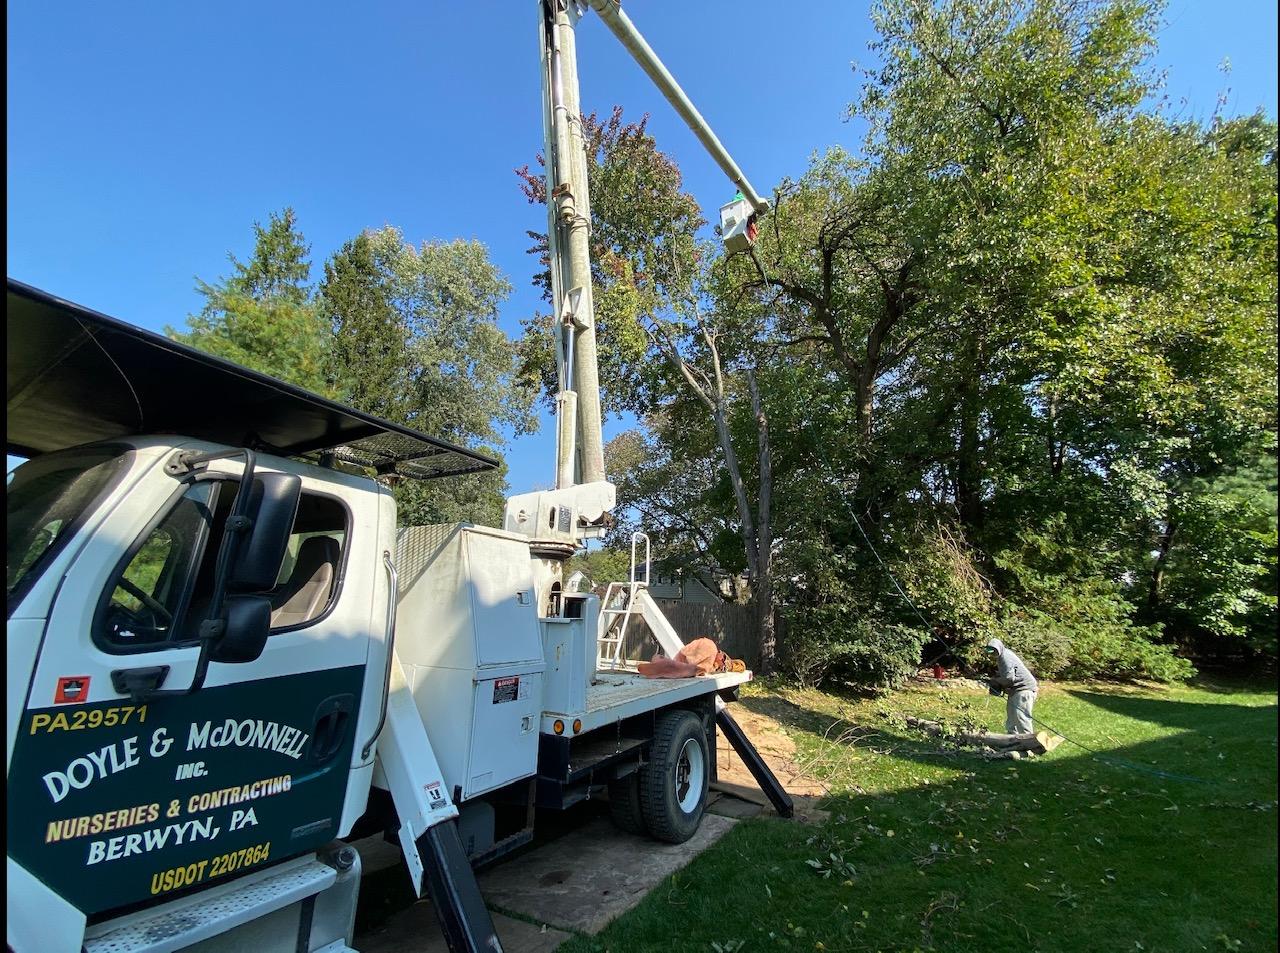 Doyle & McDonnell - Arboricultural Work Fall 2020